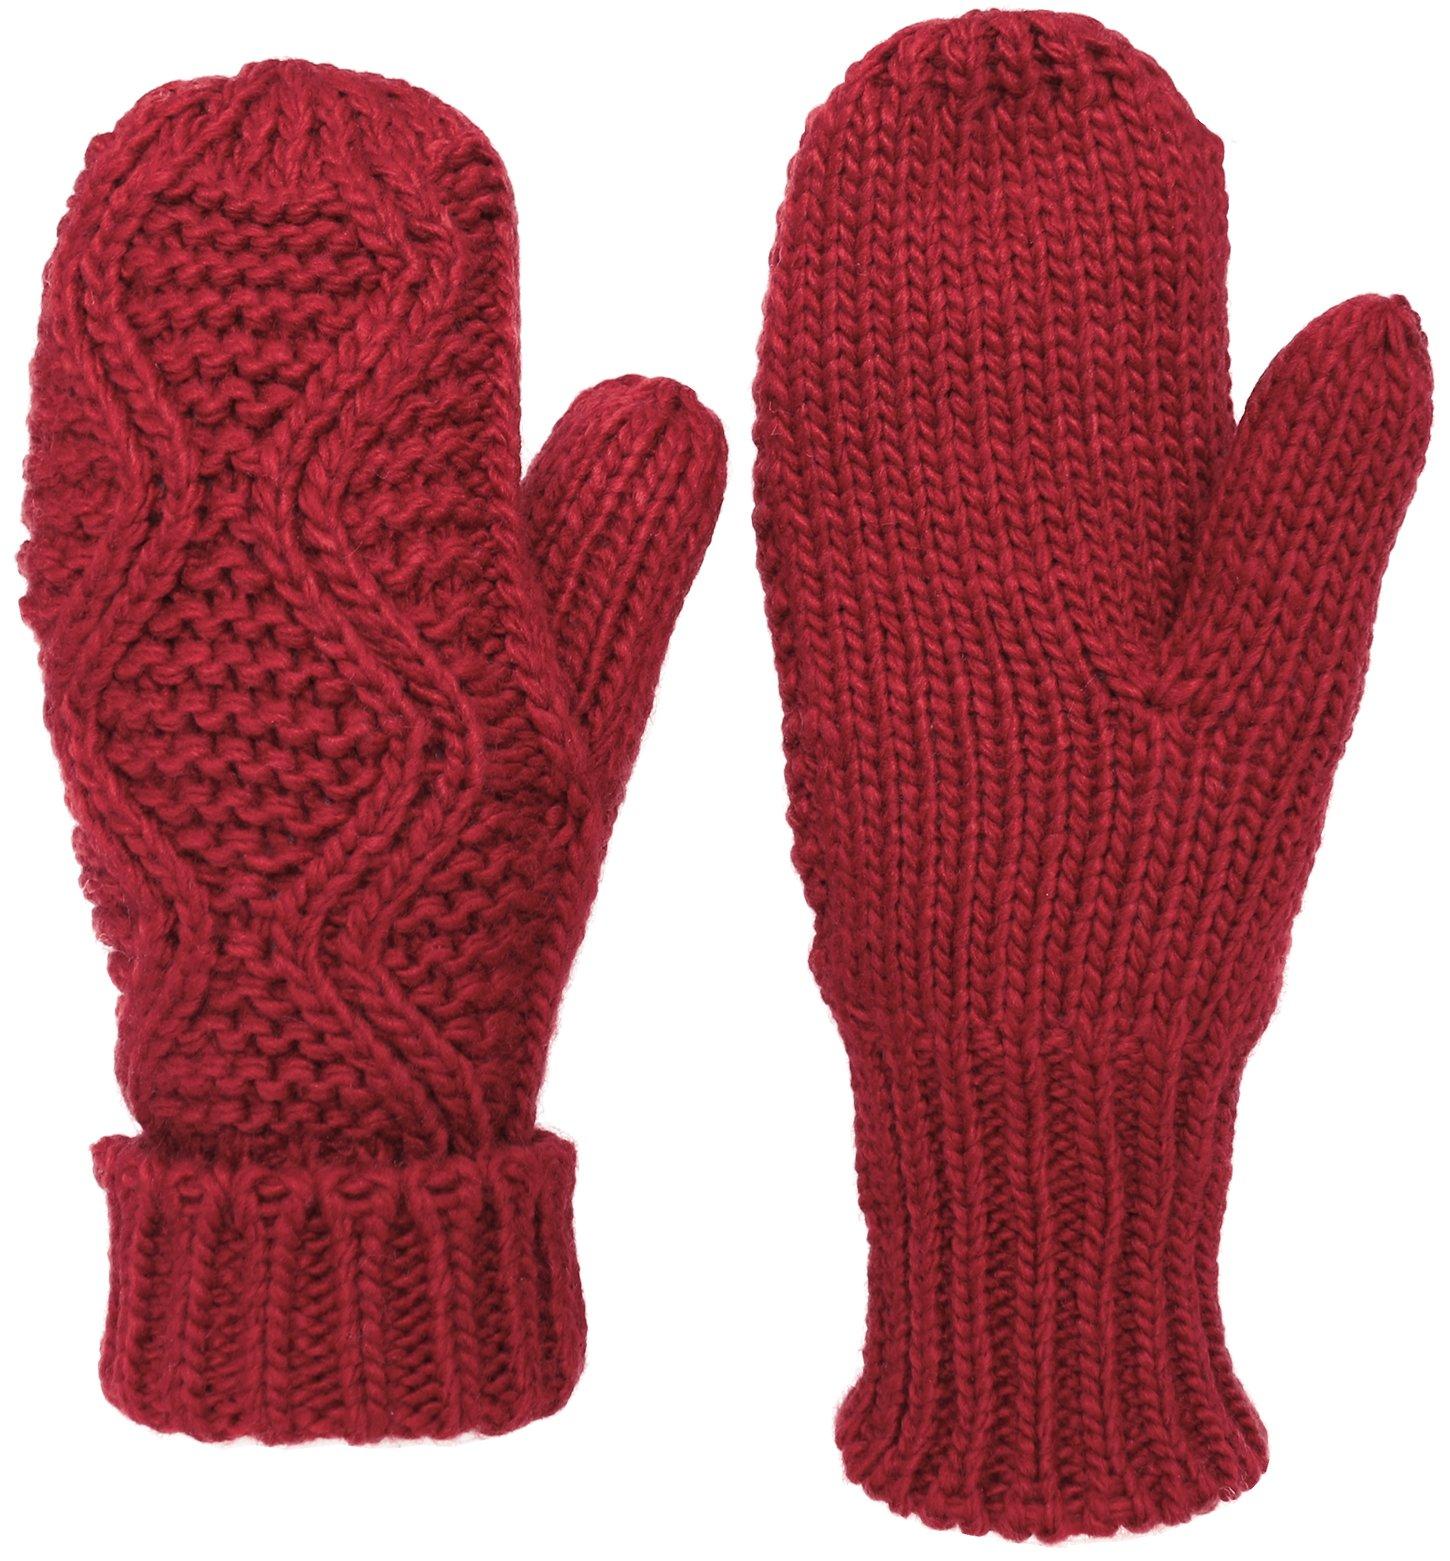 KMystic Classic Cuffed Thick Winter Knit Mittens (Burgundy)